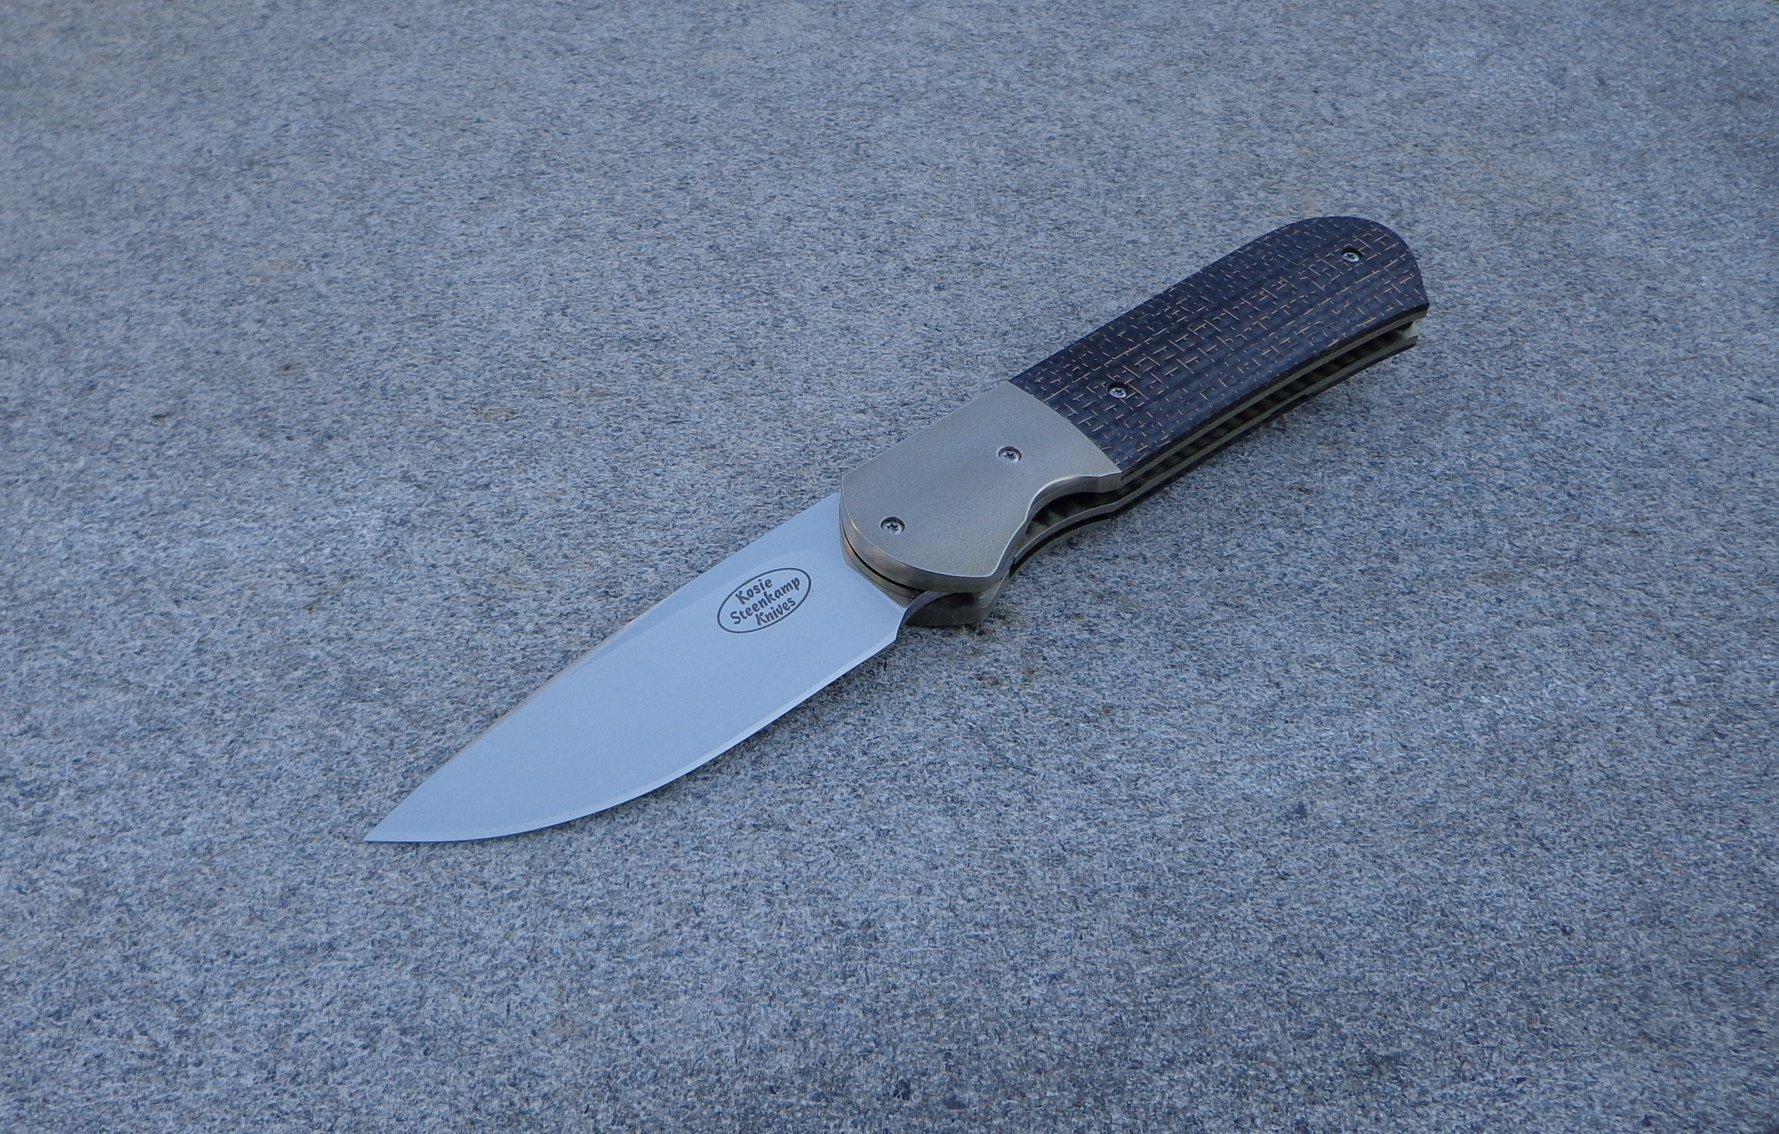 Knife: Samson Liner Lock. Blade: Böhler N690 Stainless Steel . Bolsters: Titanium, anodized golden. Liners: Titanium, anodized golden. Handle scales: LS Carbon Fiber with anodized Titanium belt clip.